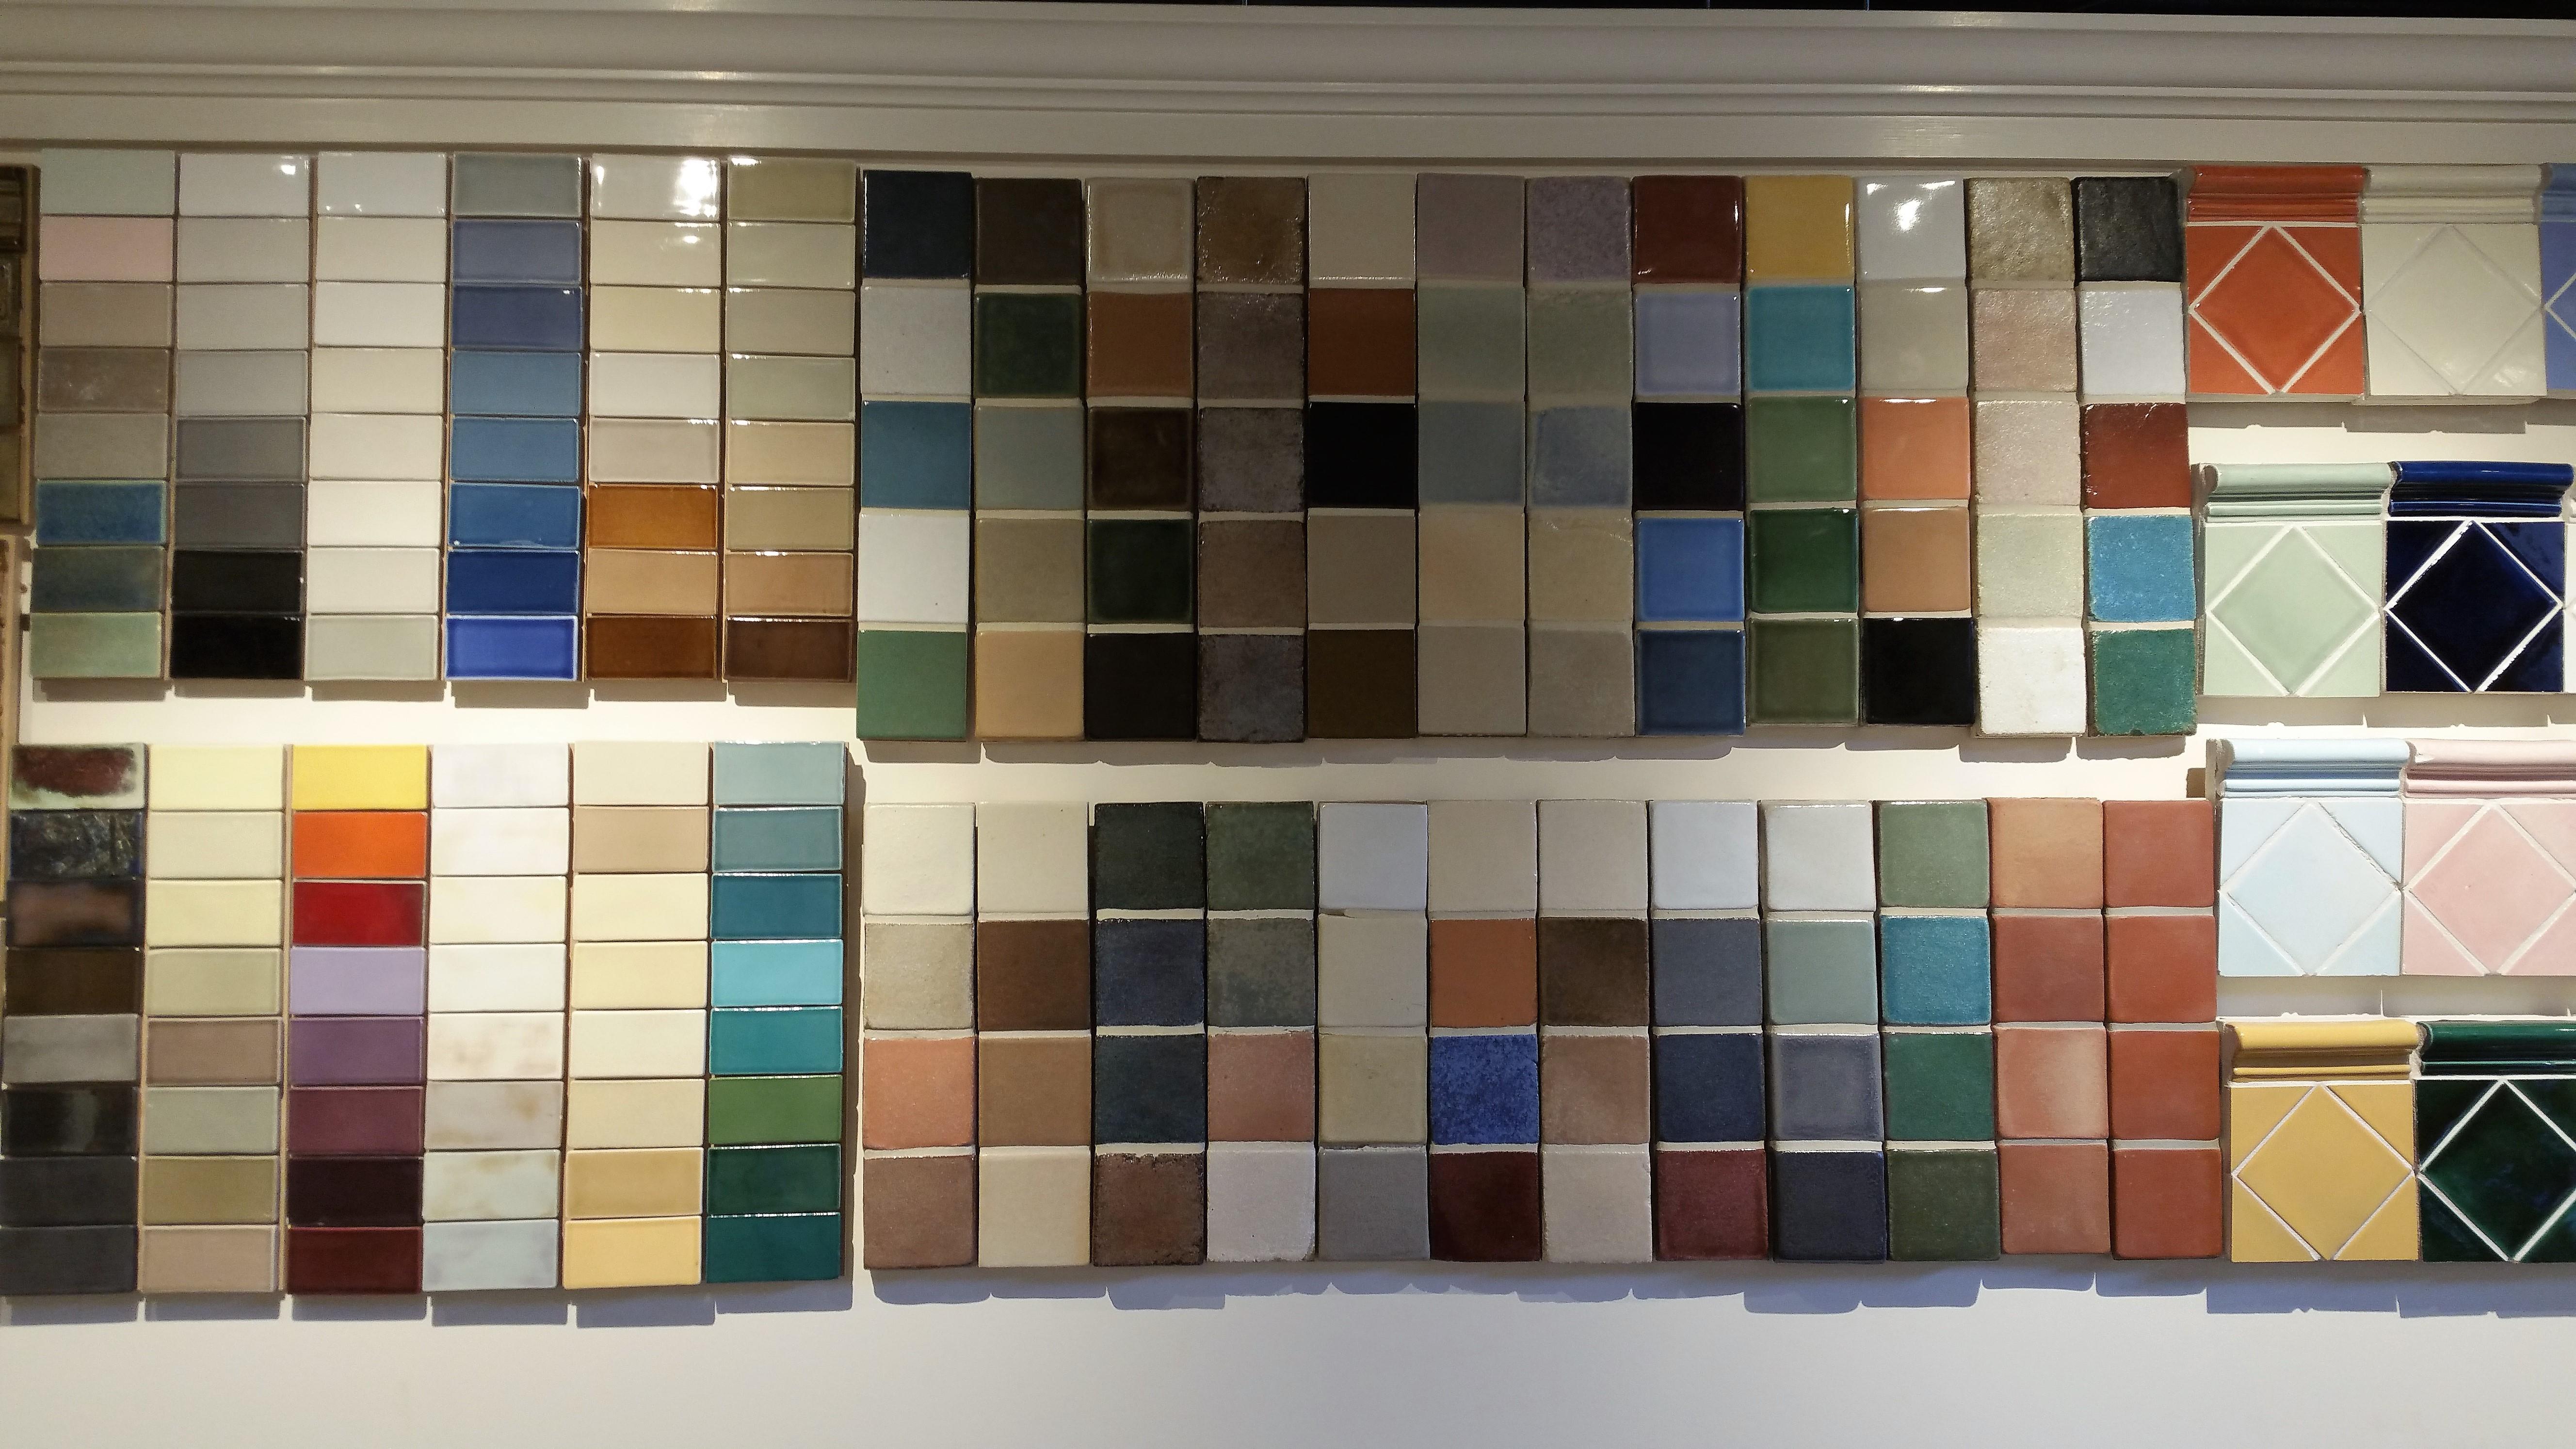 Pretty 12X12 Tiles For Kitchen Backsplash Thin 12X24 Ceiling Tile Flat 12X24 Ceramic Tile 24 Inch Ceramic Tile Youthful 24 X 48 Ceiling Tiles Black3X6 Subway Tile Backsplash Hispanic Design | Handmade Ceramic Tiles